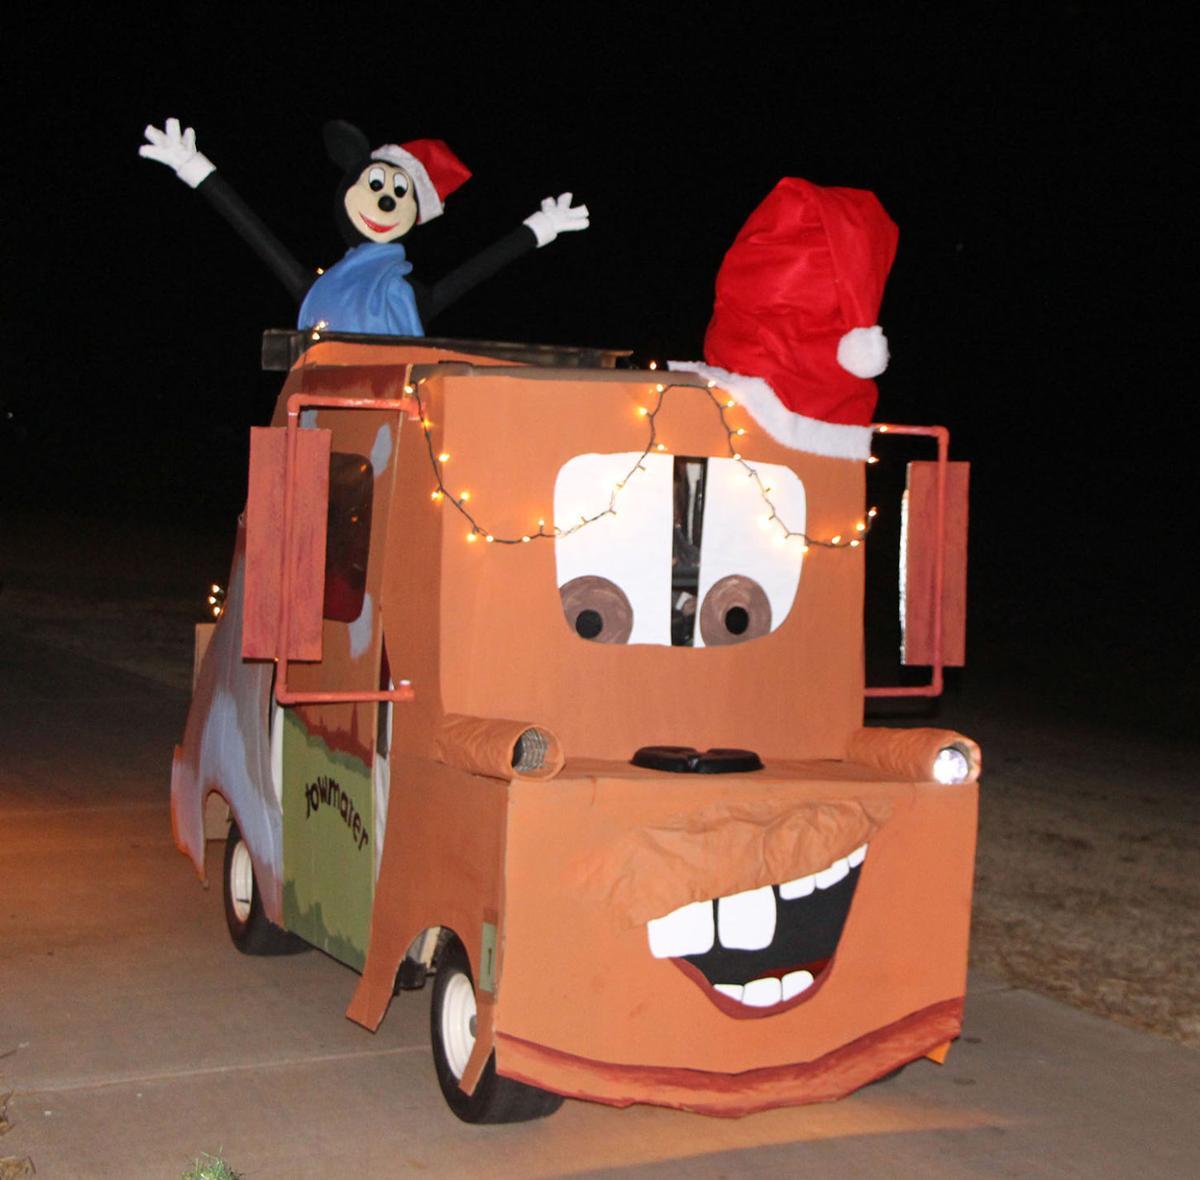 Xmas Golf Cart Parade Themes Html on